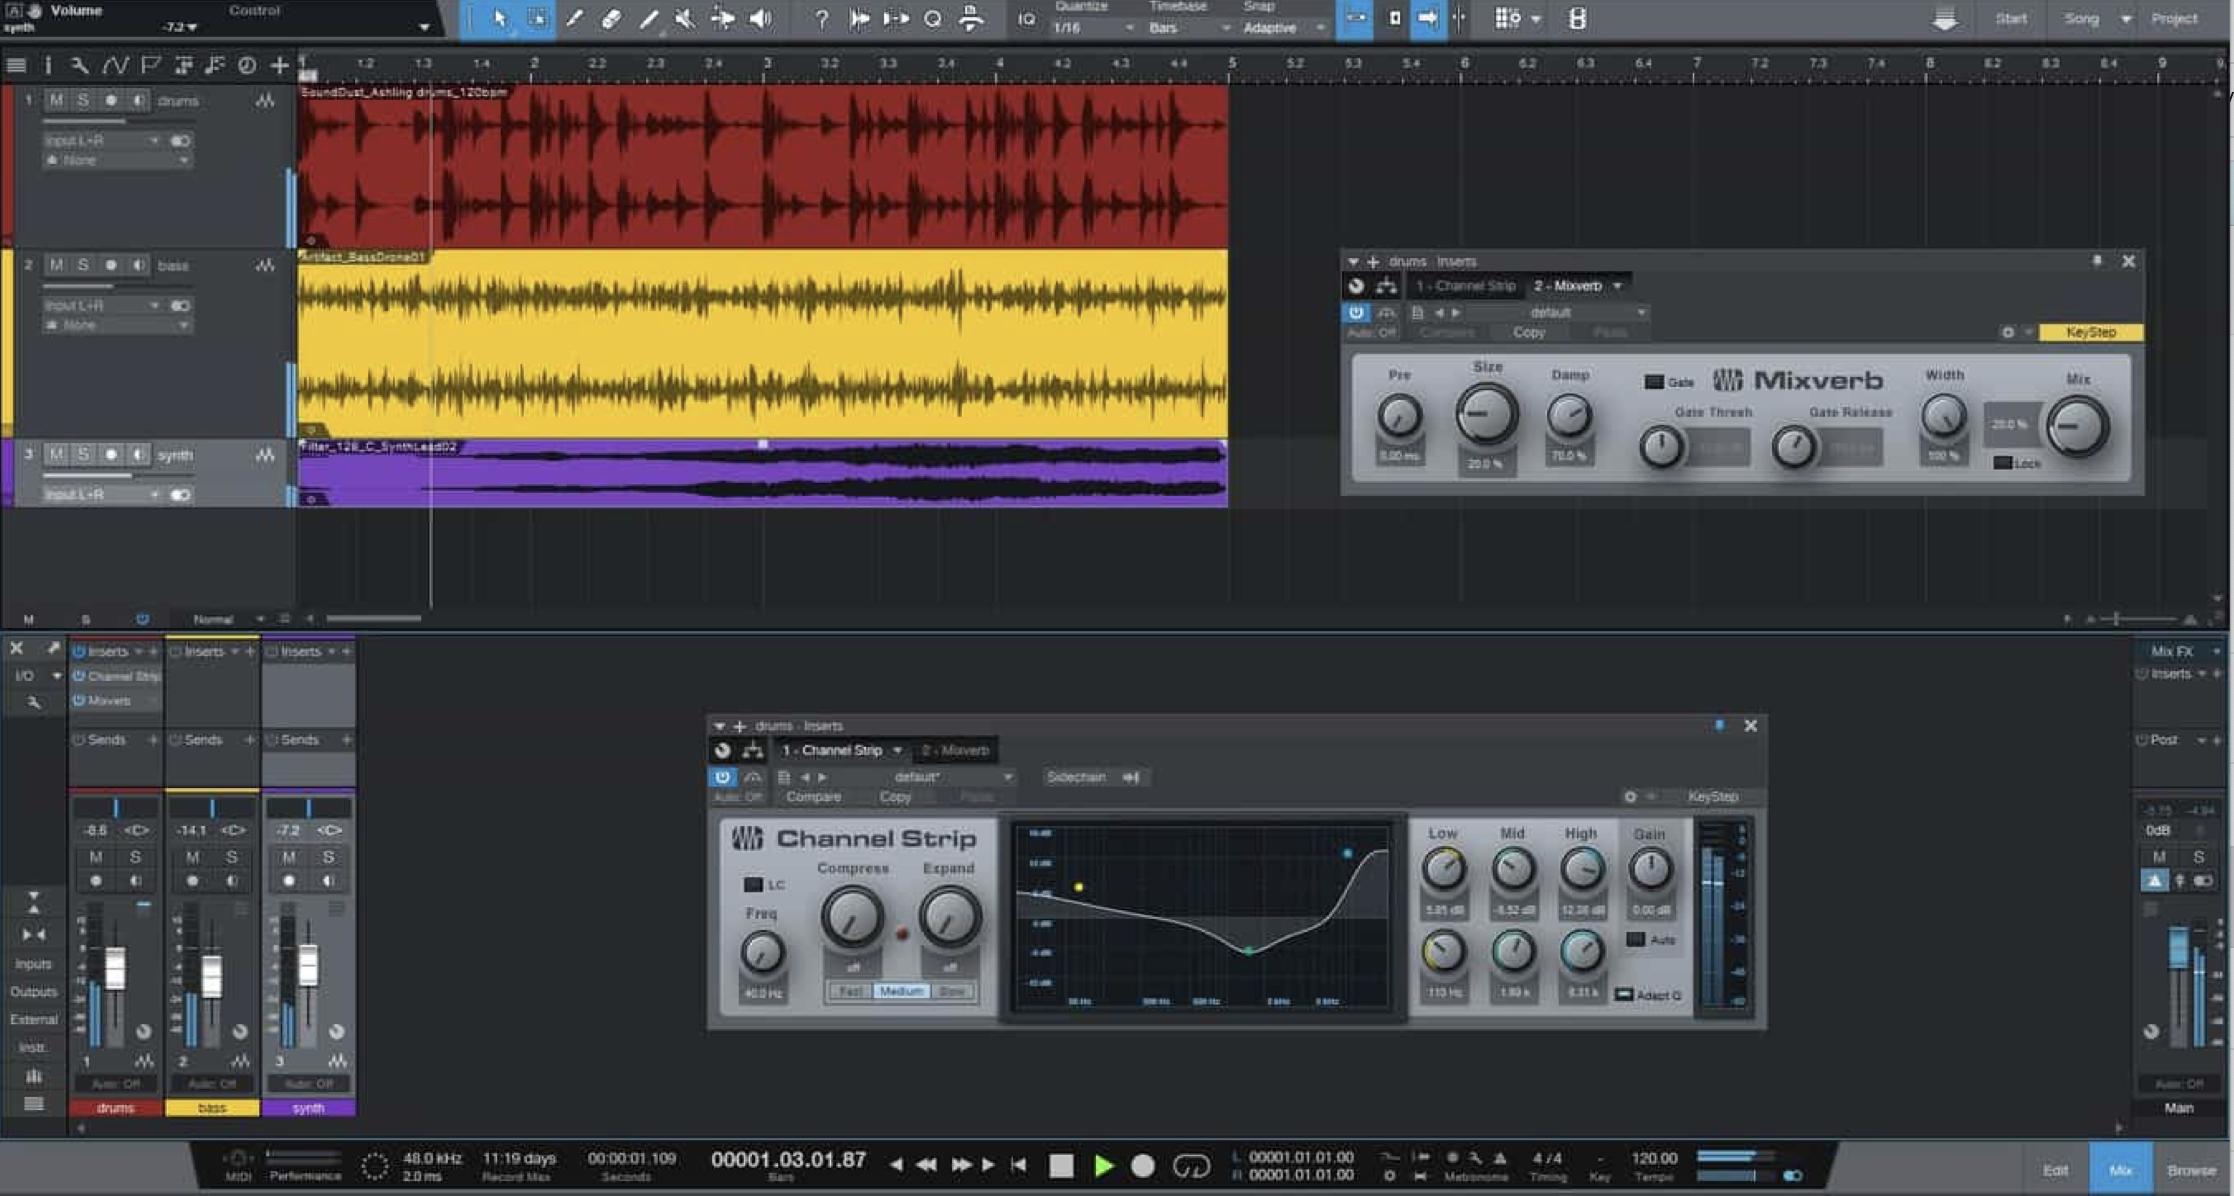 Studio One Prime User Interface